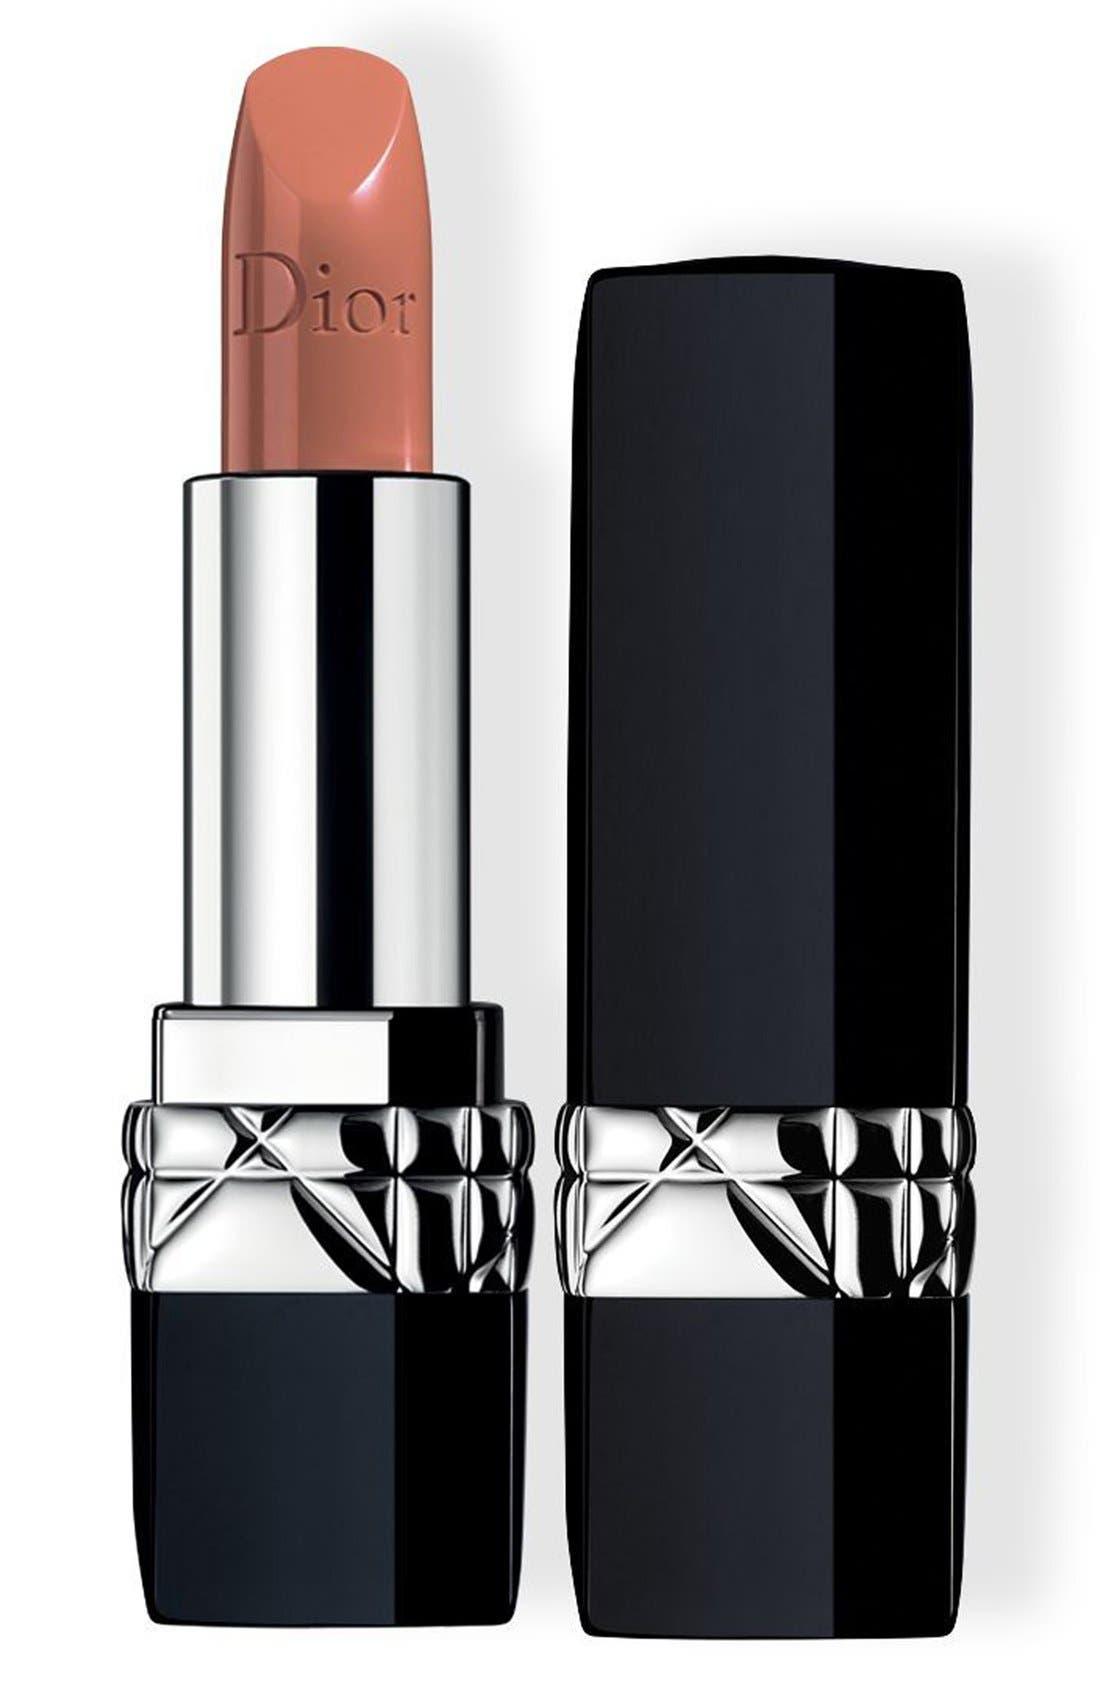 Dior Couture Color Rouge Dior Lipstick - 169 Grege 1947